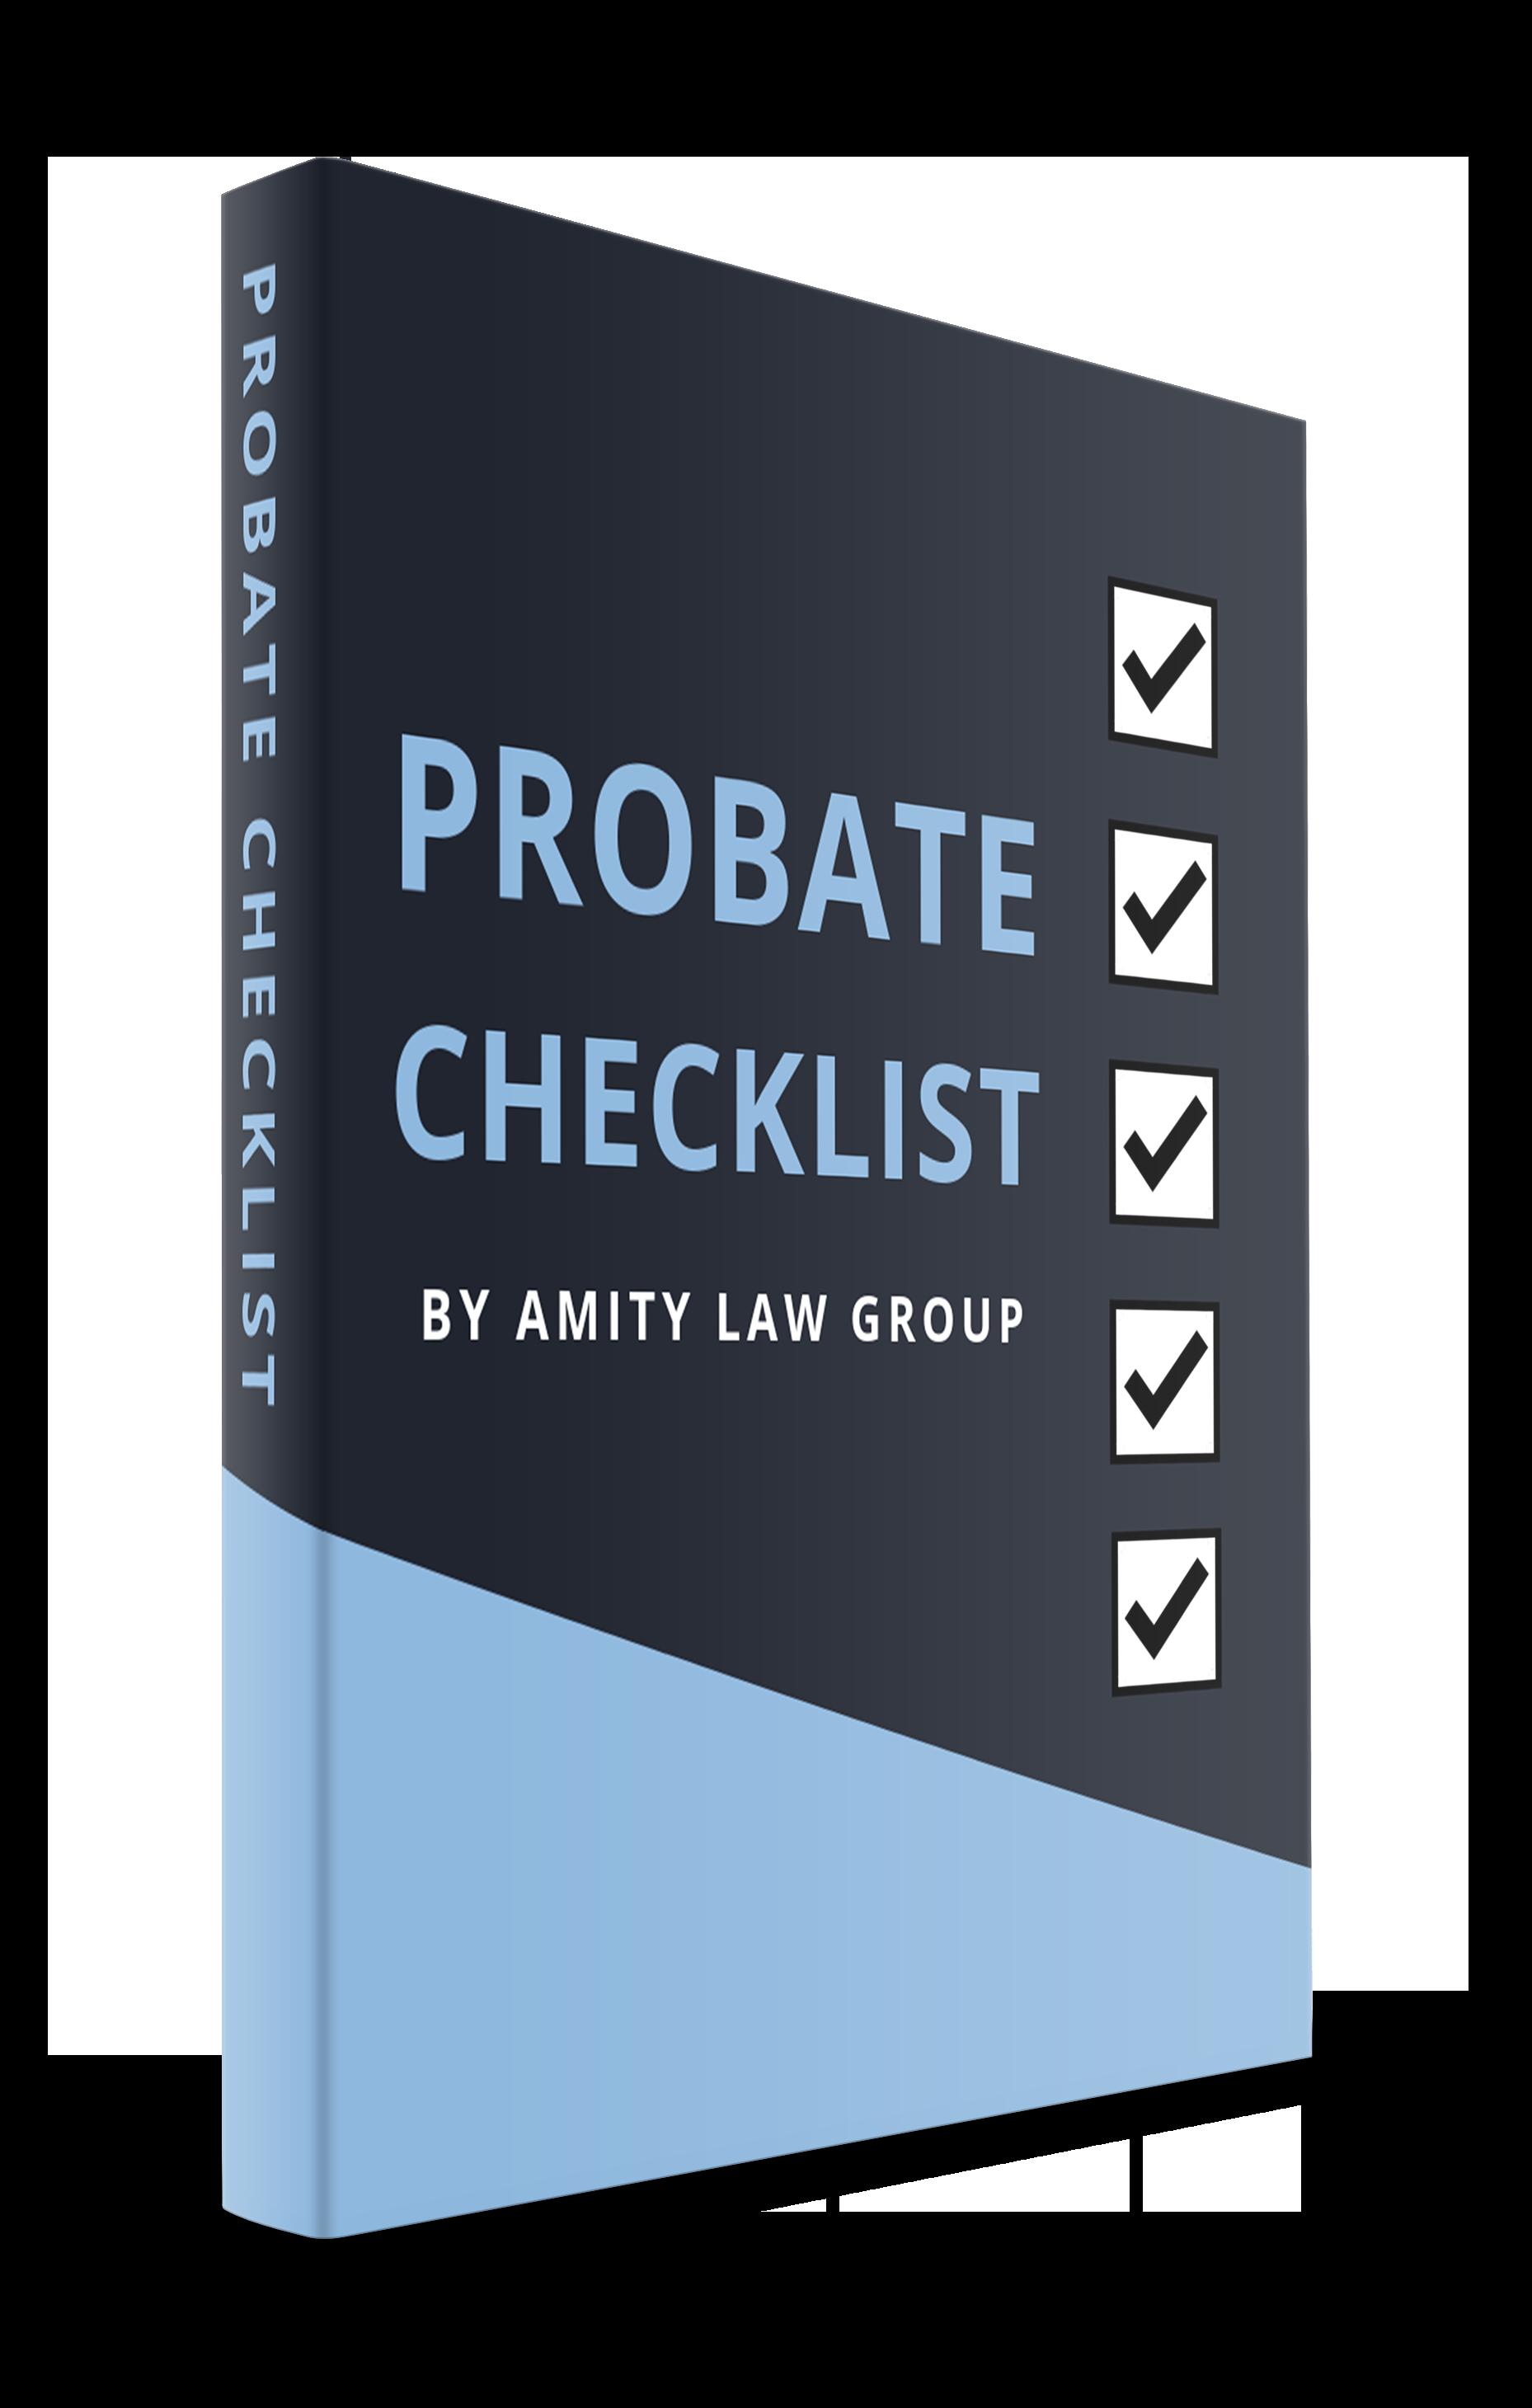 Probate Checklist 3D Cover (transparent).png